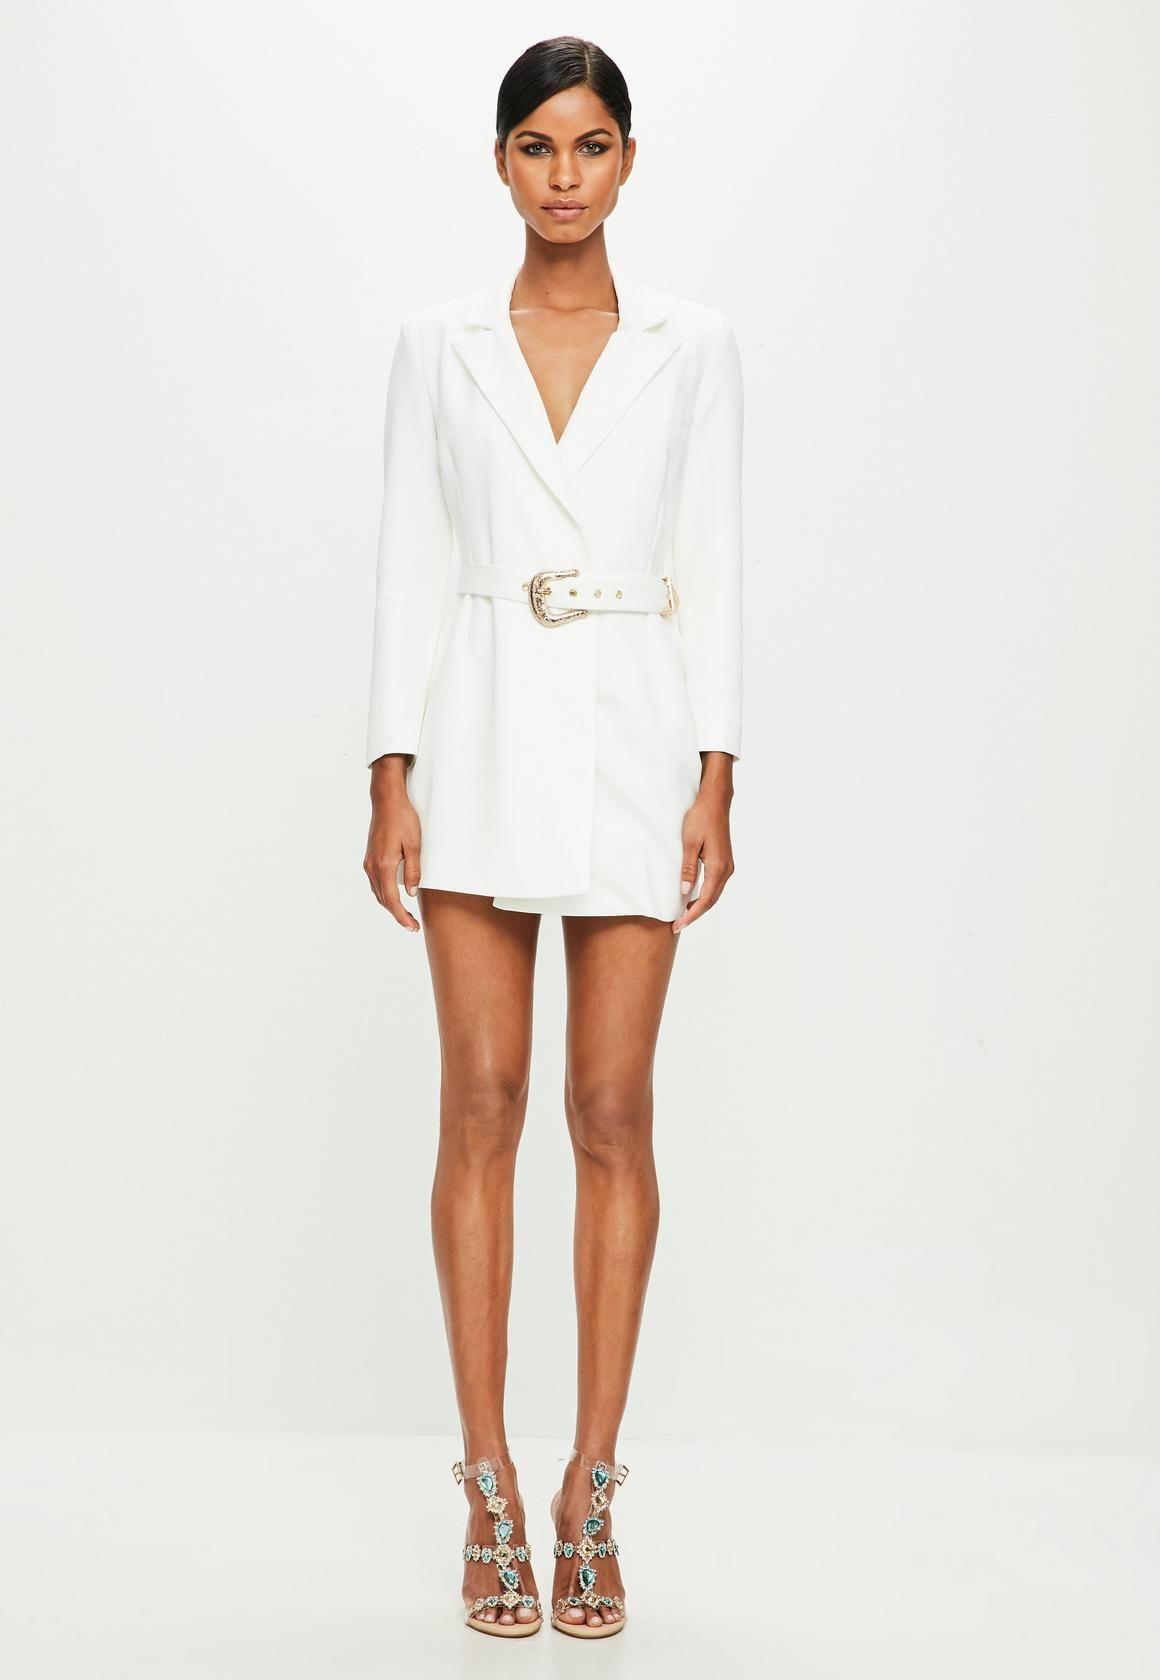 1e958e7f0b1 Missguided - Peace Love White Belted Blazer Dress